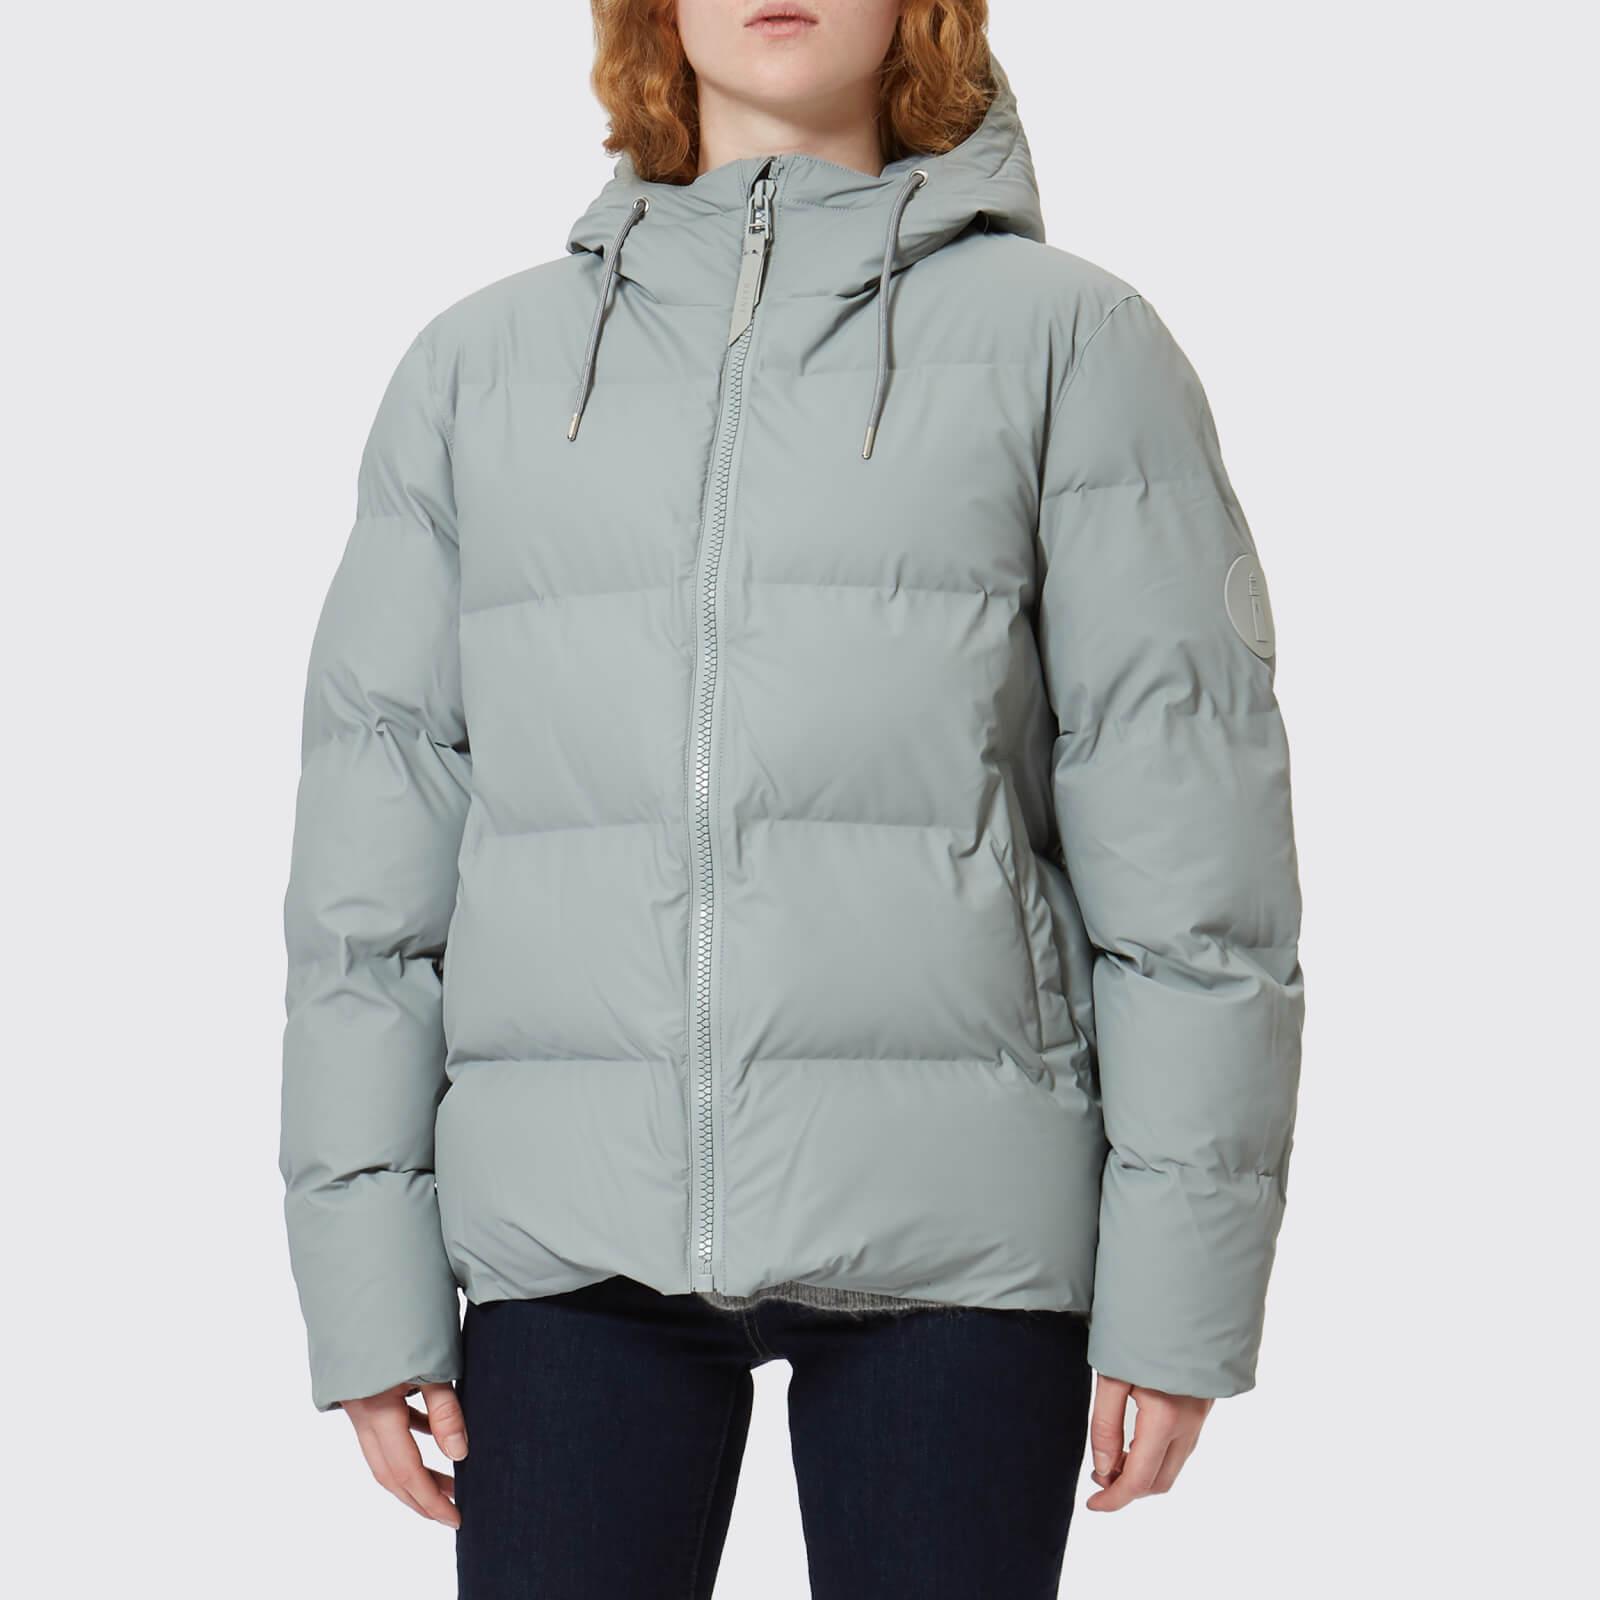 RAINS Women's Puffa Jacket - Stone - M-L - Grey